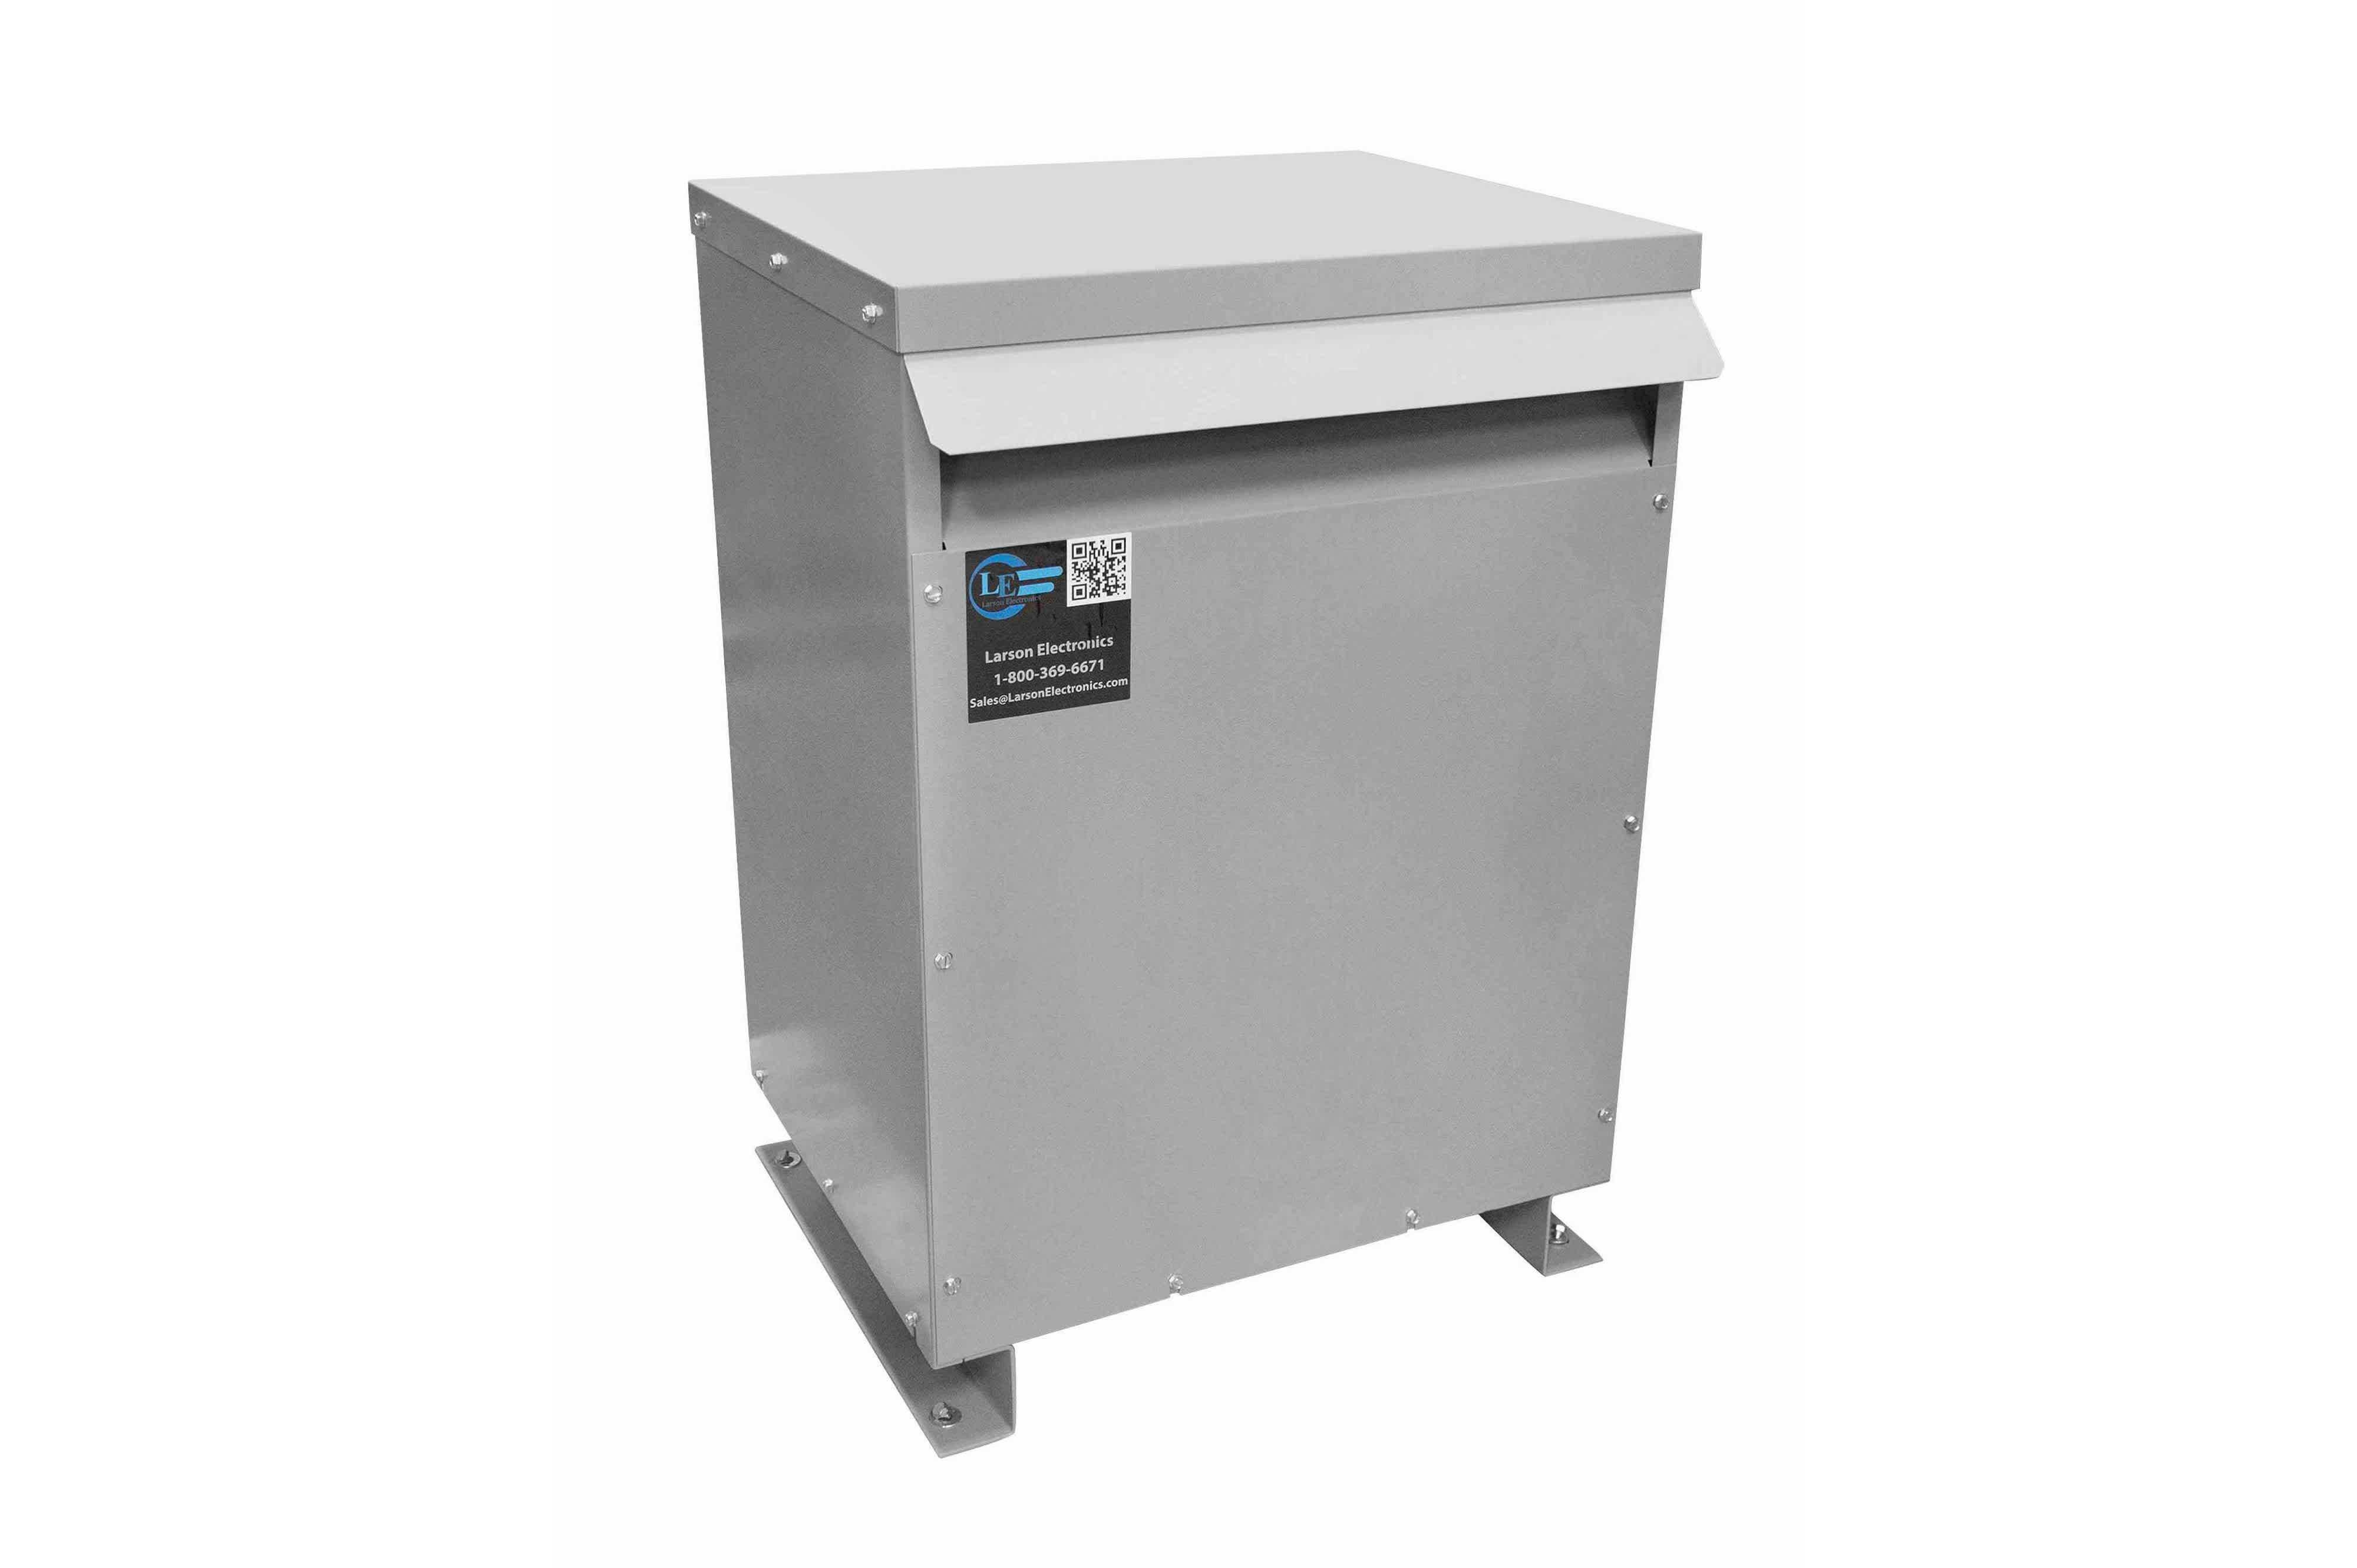 45 kVA 3PH Isolation Transformer, 480V Wye Primary, 415Y/240 Wye-N Secondary, N3R, Ventilated, 60 Hz